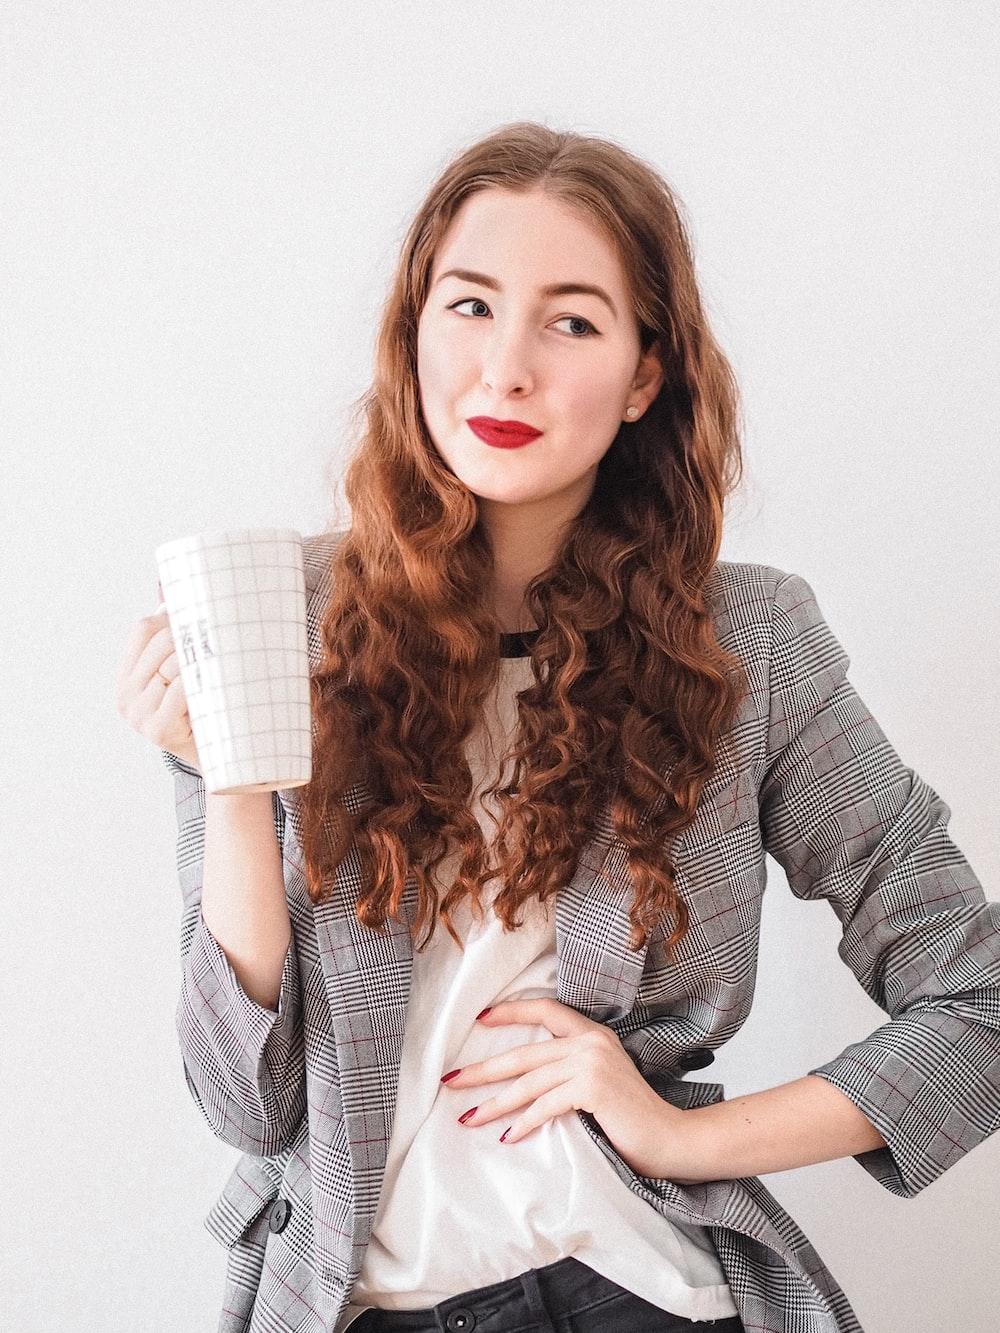 woman in gray cardigan holding white ceramic mug